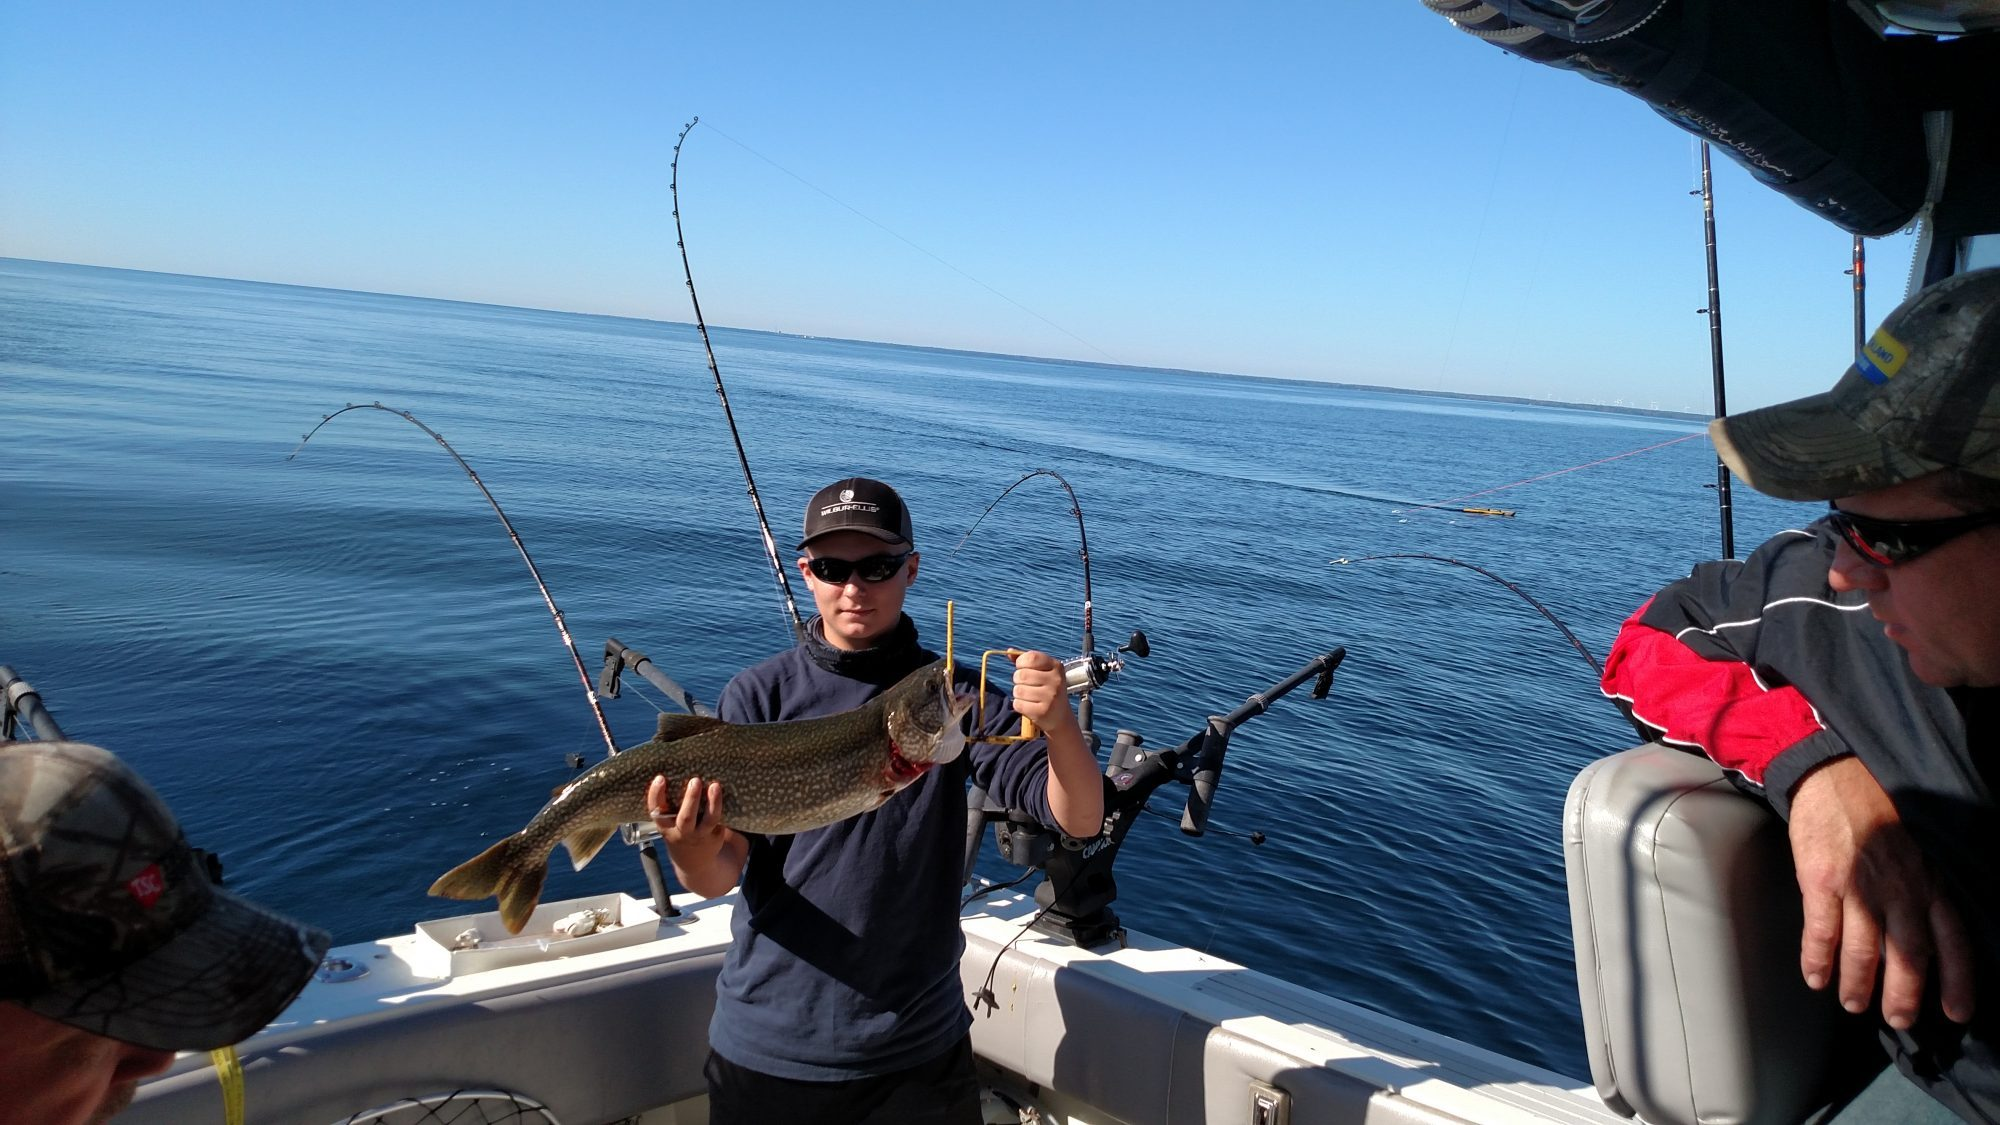 Harbor beach weekly fishing report 07 19 2017 j lyn charters for Weekly fishing report mi